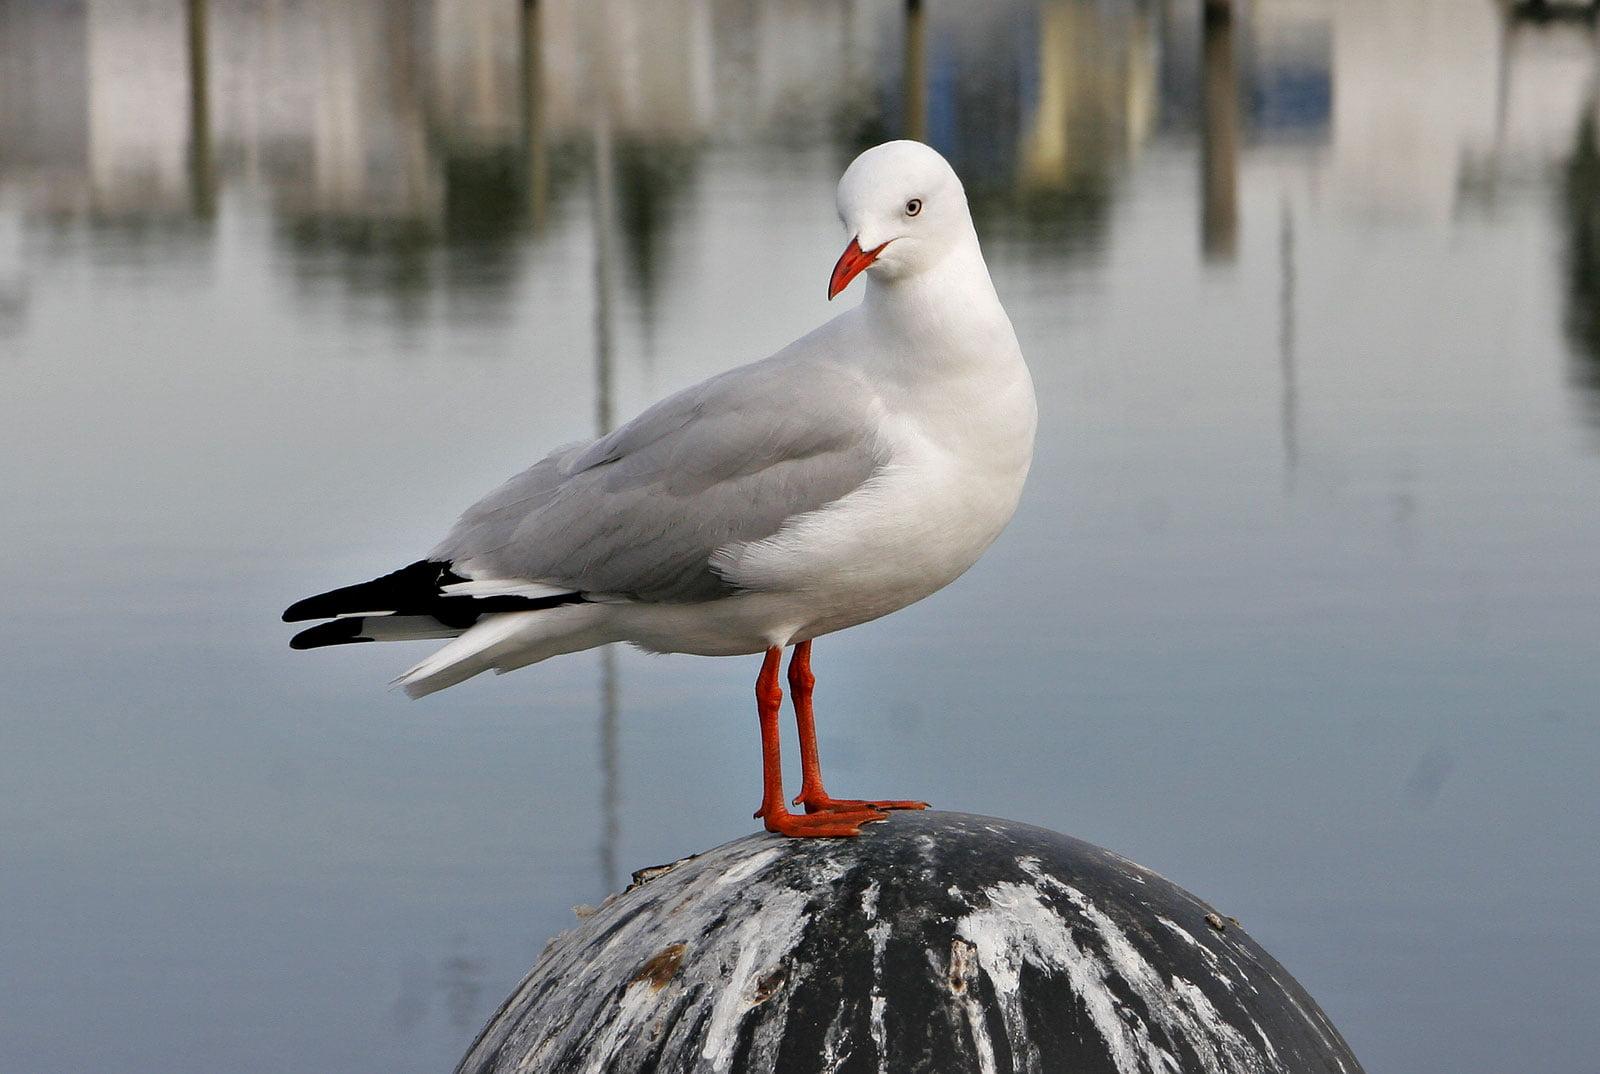 Seagull_on_sale_pier